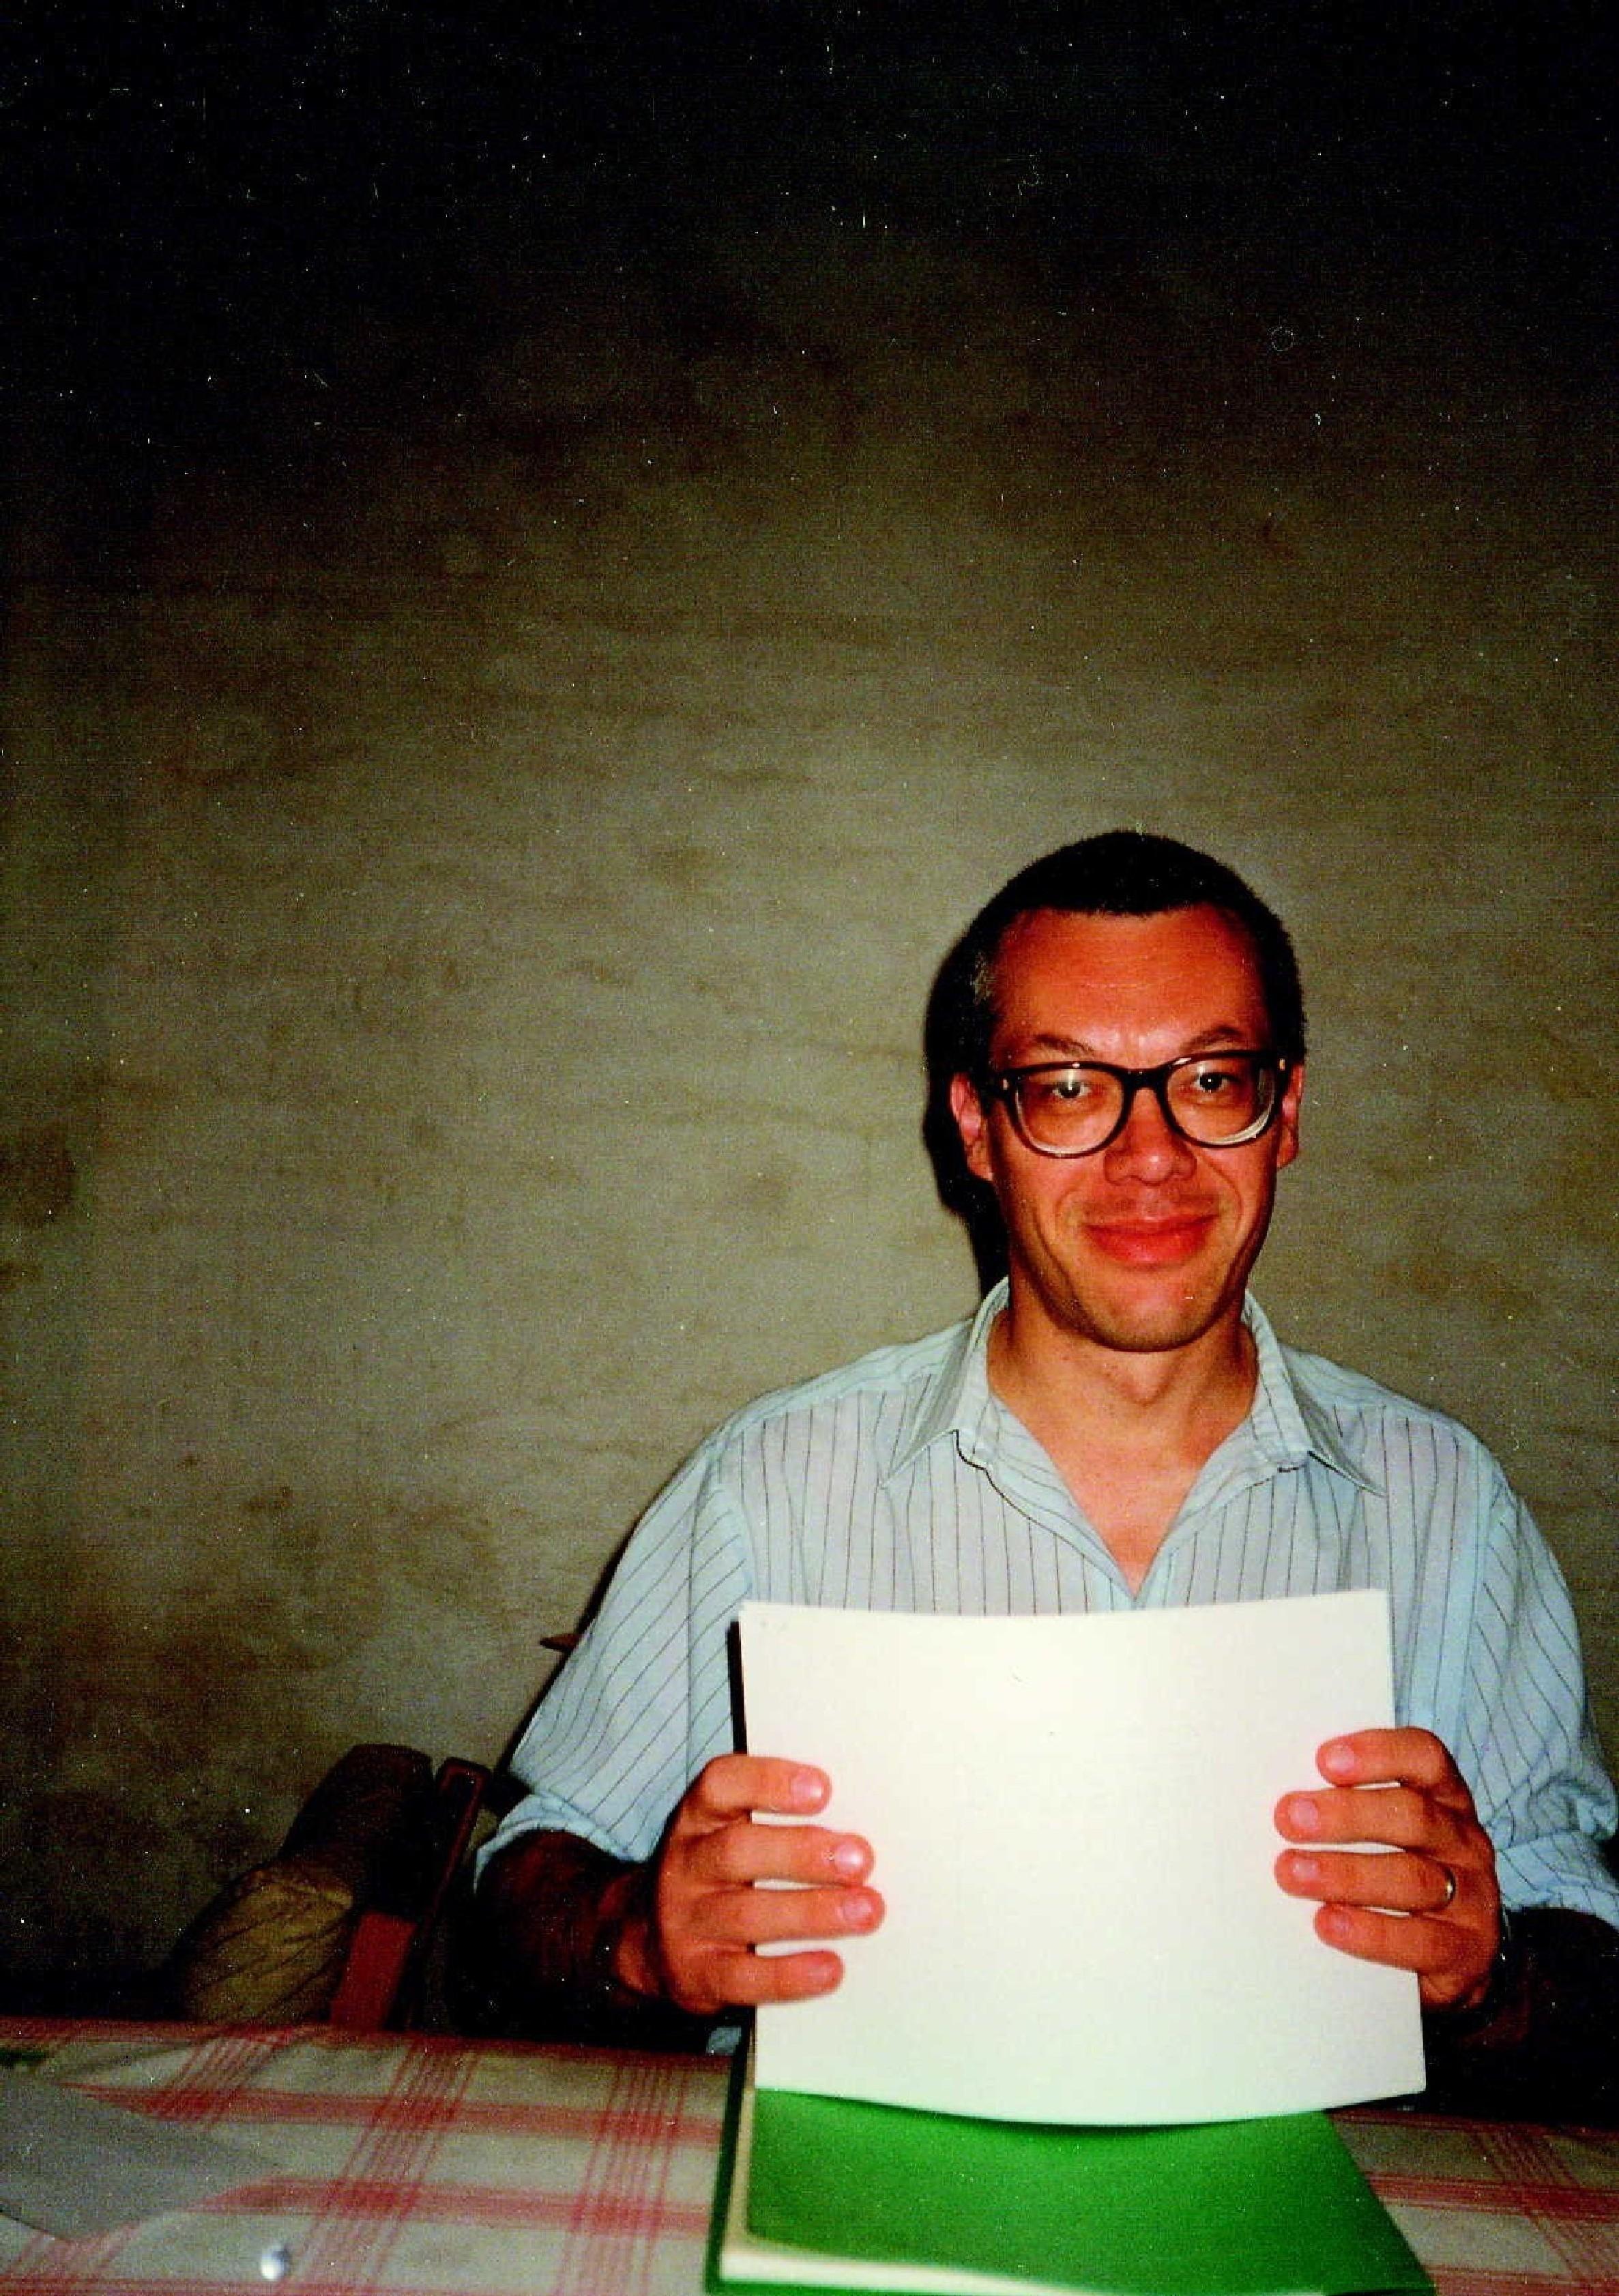 Portrait de BAETENS Jan